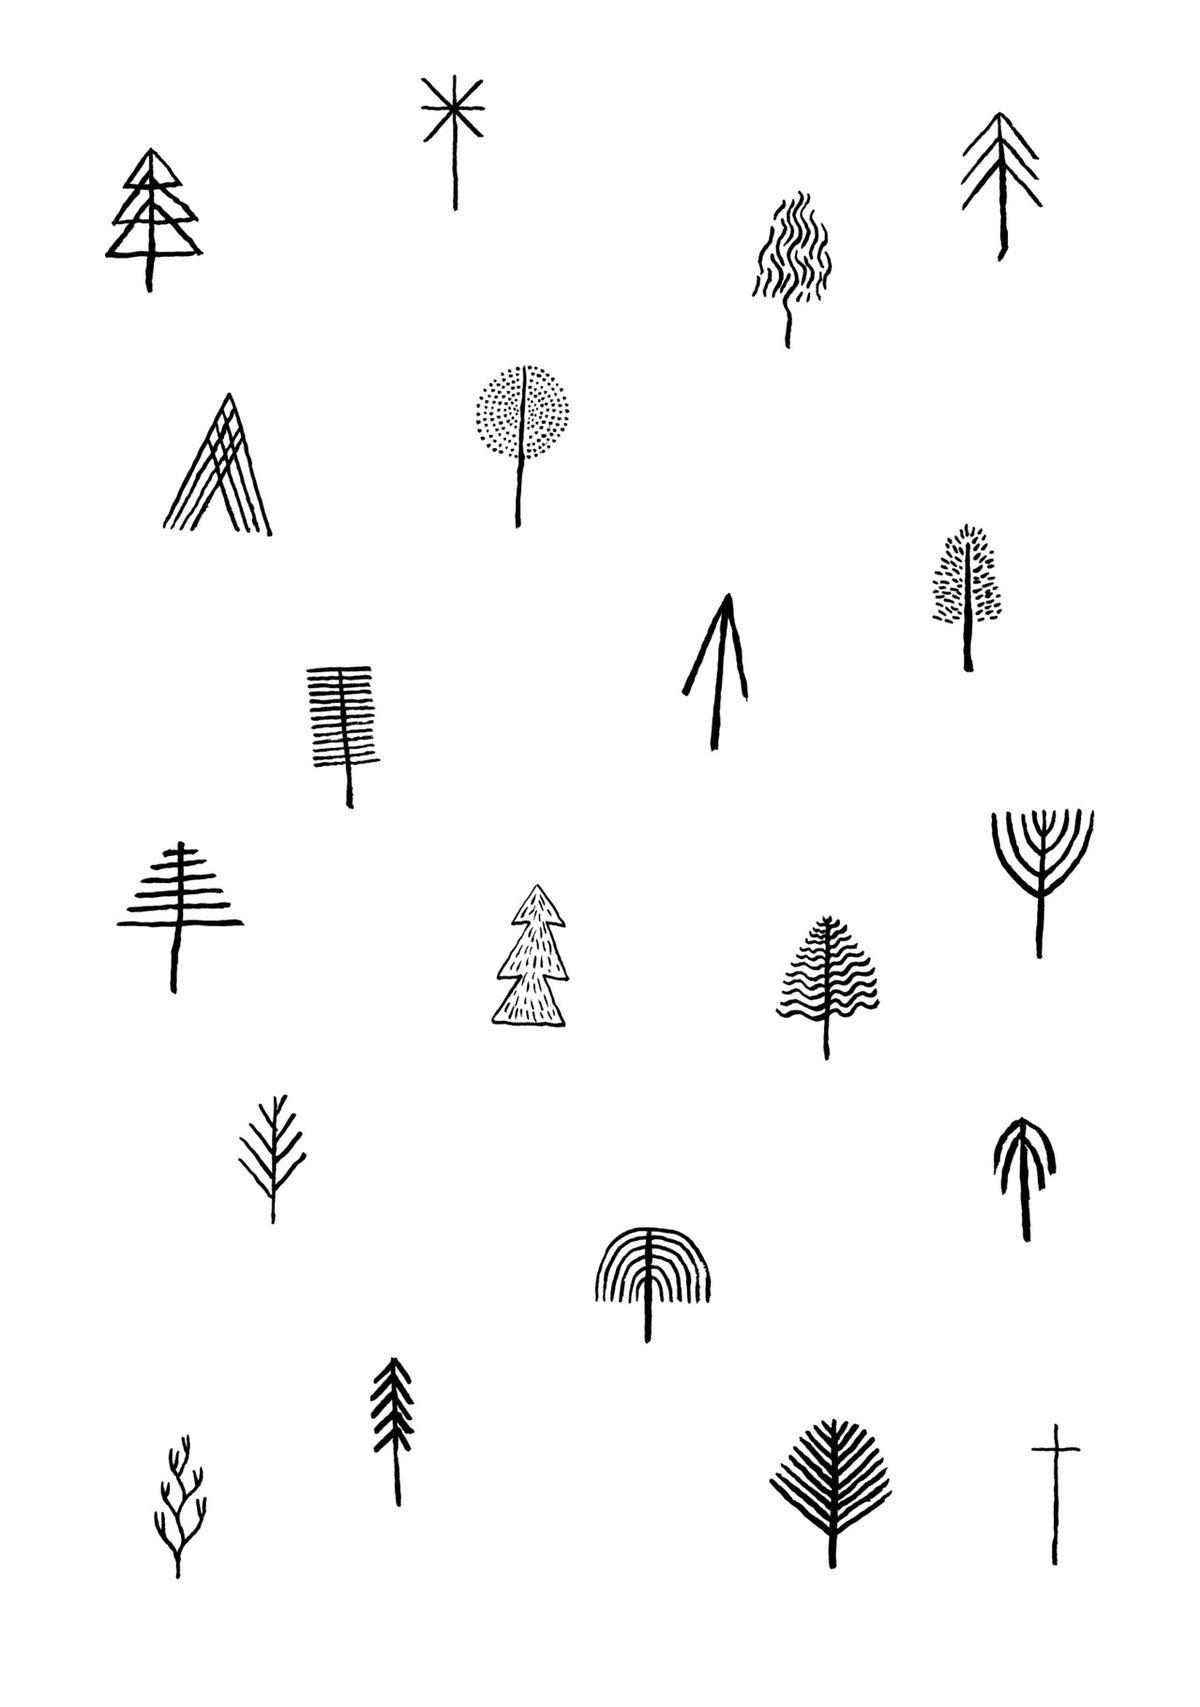 Christmas Tree Tattoo Small.Christmas Tree Branding Shapes In 2019 Tattoos Cool